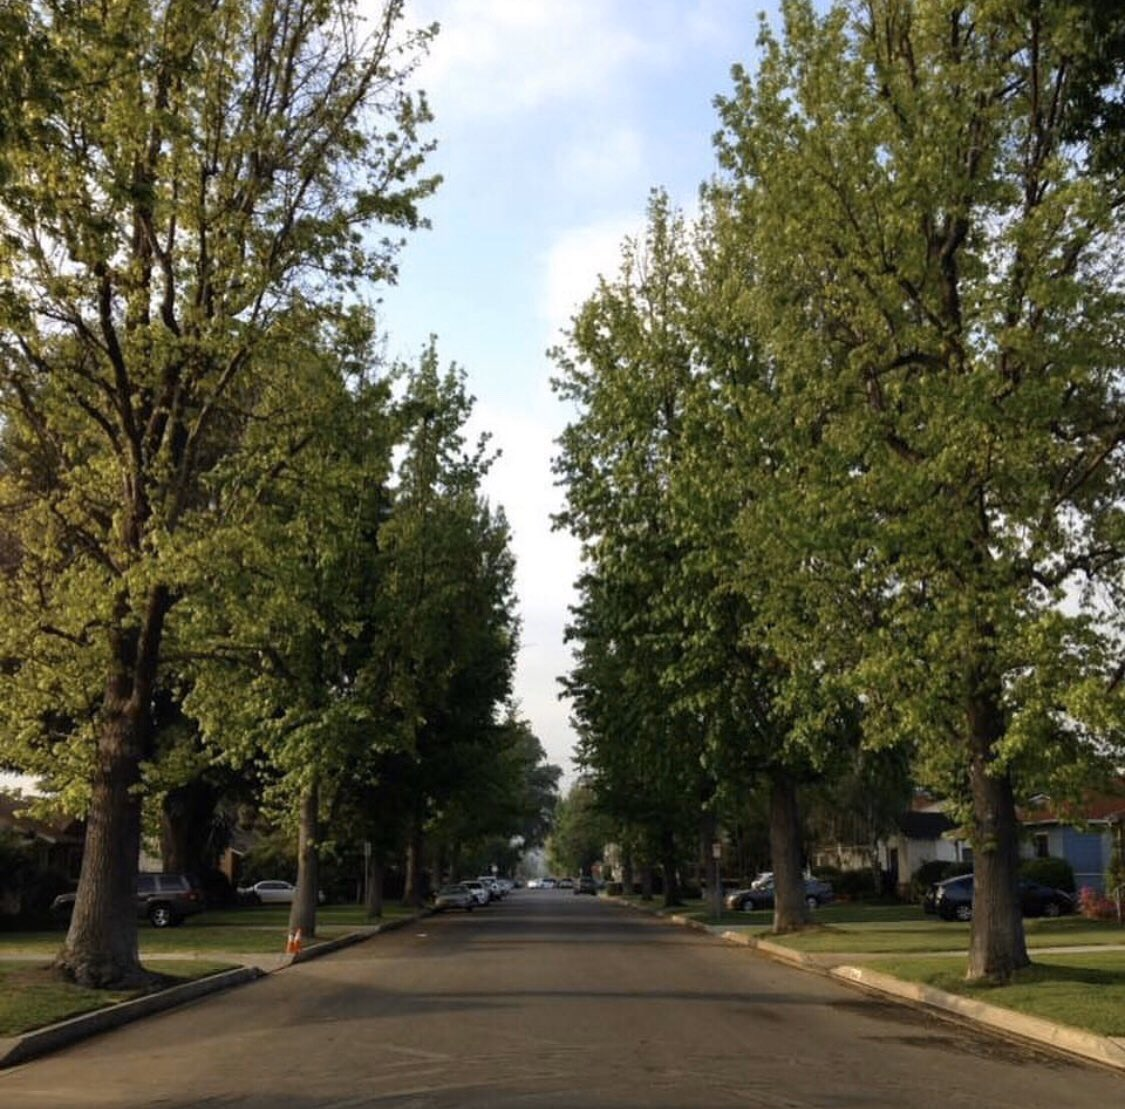 Same street, different season, the wonder of nature. SWIPE ⬅️ 🌿🍃 #summer #fall #winter #spring  • • • • #neighborhood #treelinedstreet #streetphotography #season #fourseasons #nature #naturephotography #changeofleaves #truebeauty 📸🌏